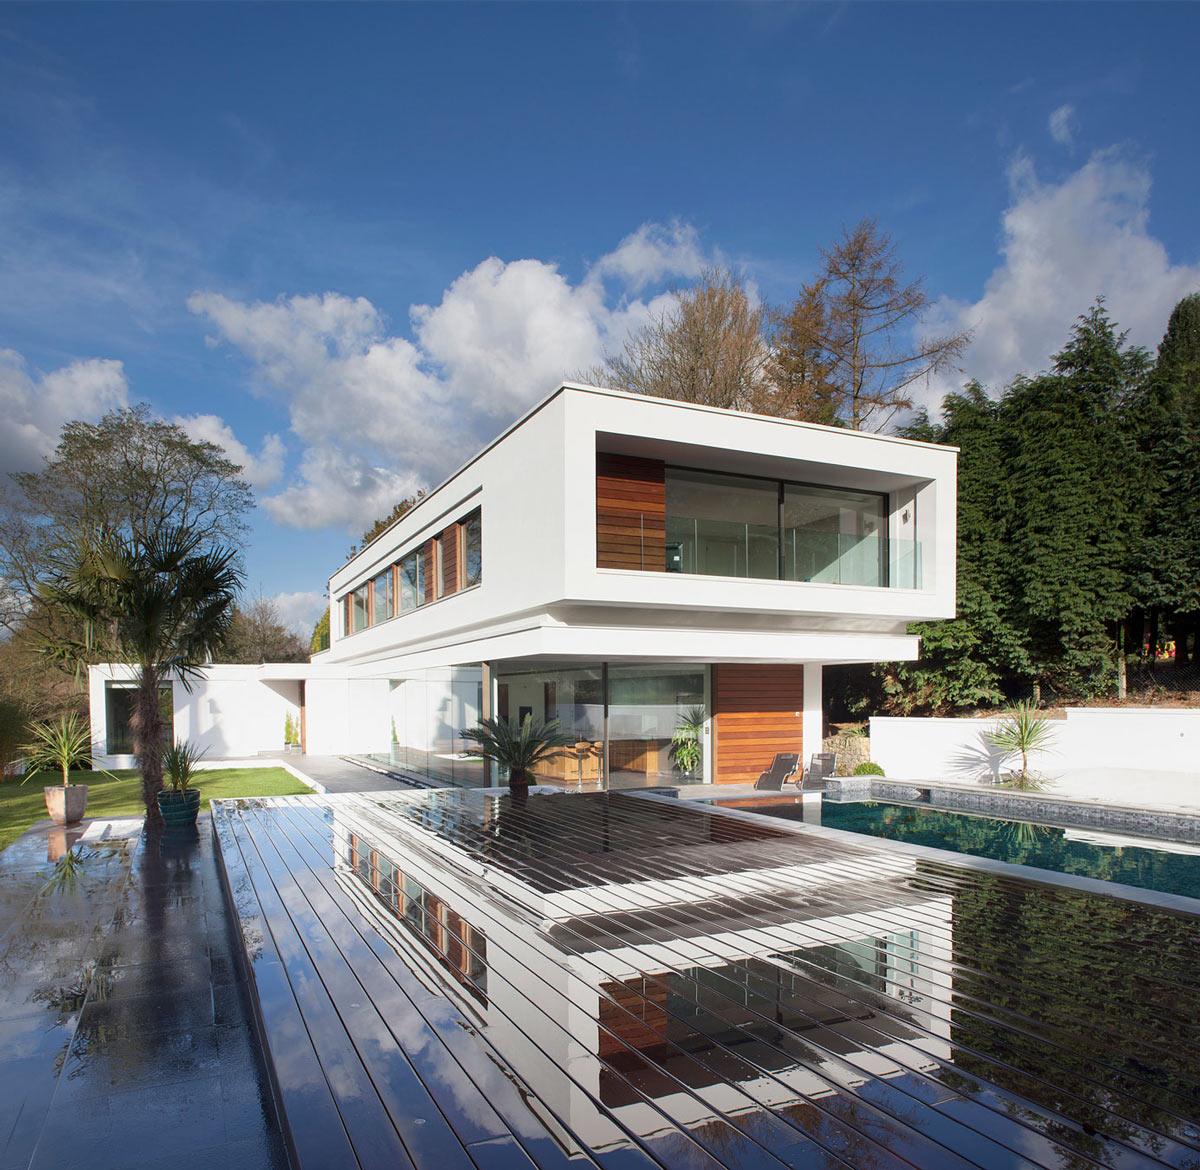 Ecofriendly Modern Home In Tandridge, England